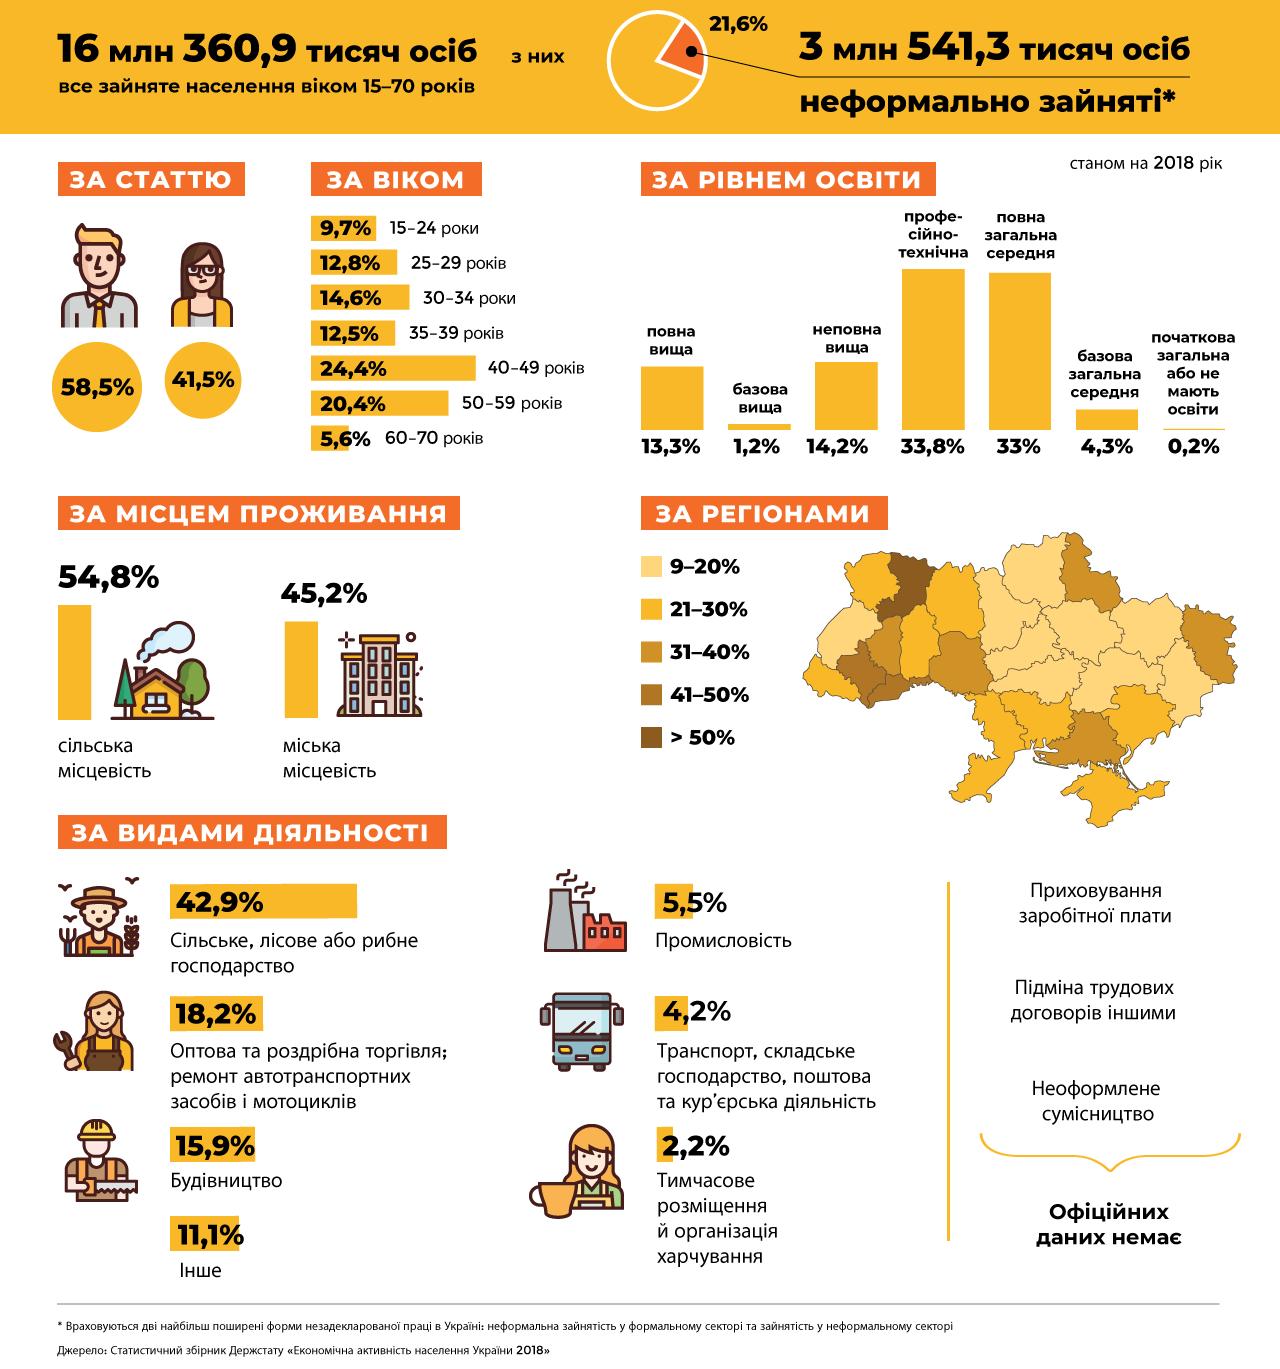 https://dsp.gov.ua/wp-content/uploads/2020/01/ilo_infographic1_3_ukr-e1579623759353.png